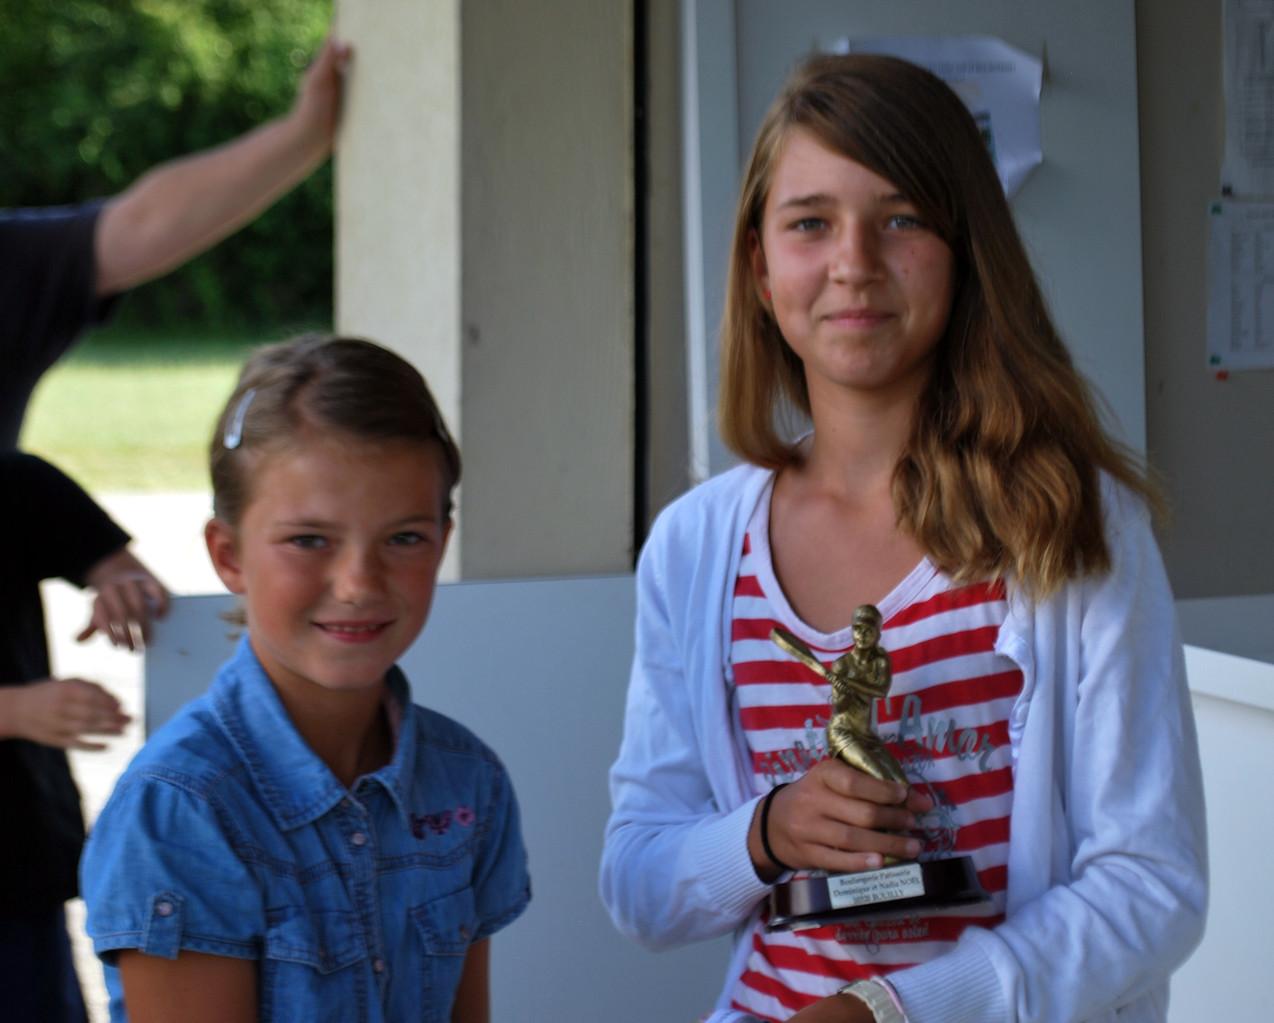 Alice Pointu la vainqueure du tournoi 2013 : allez Bouilly!!